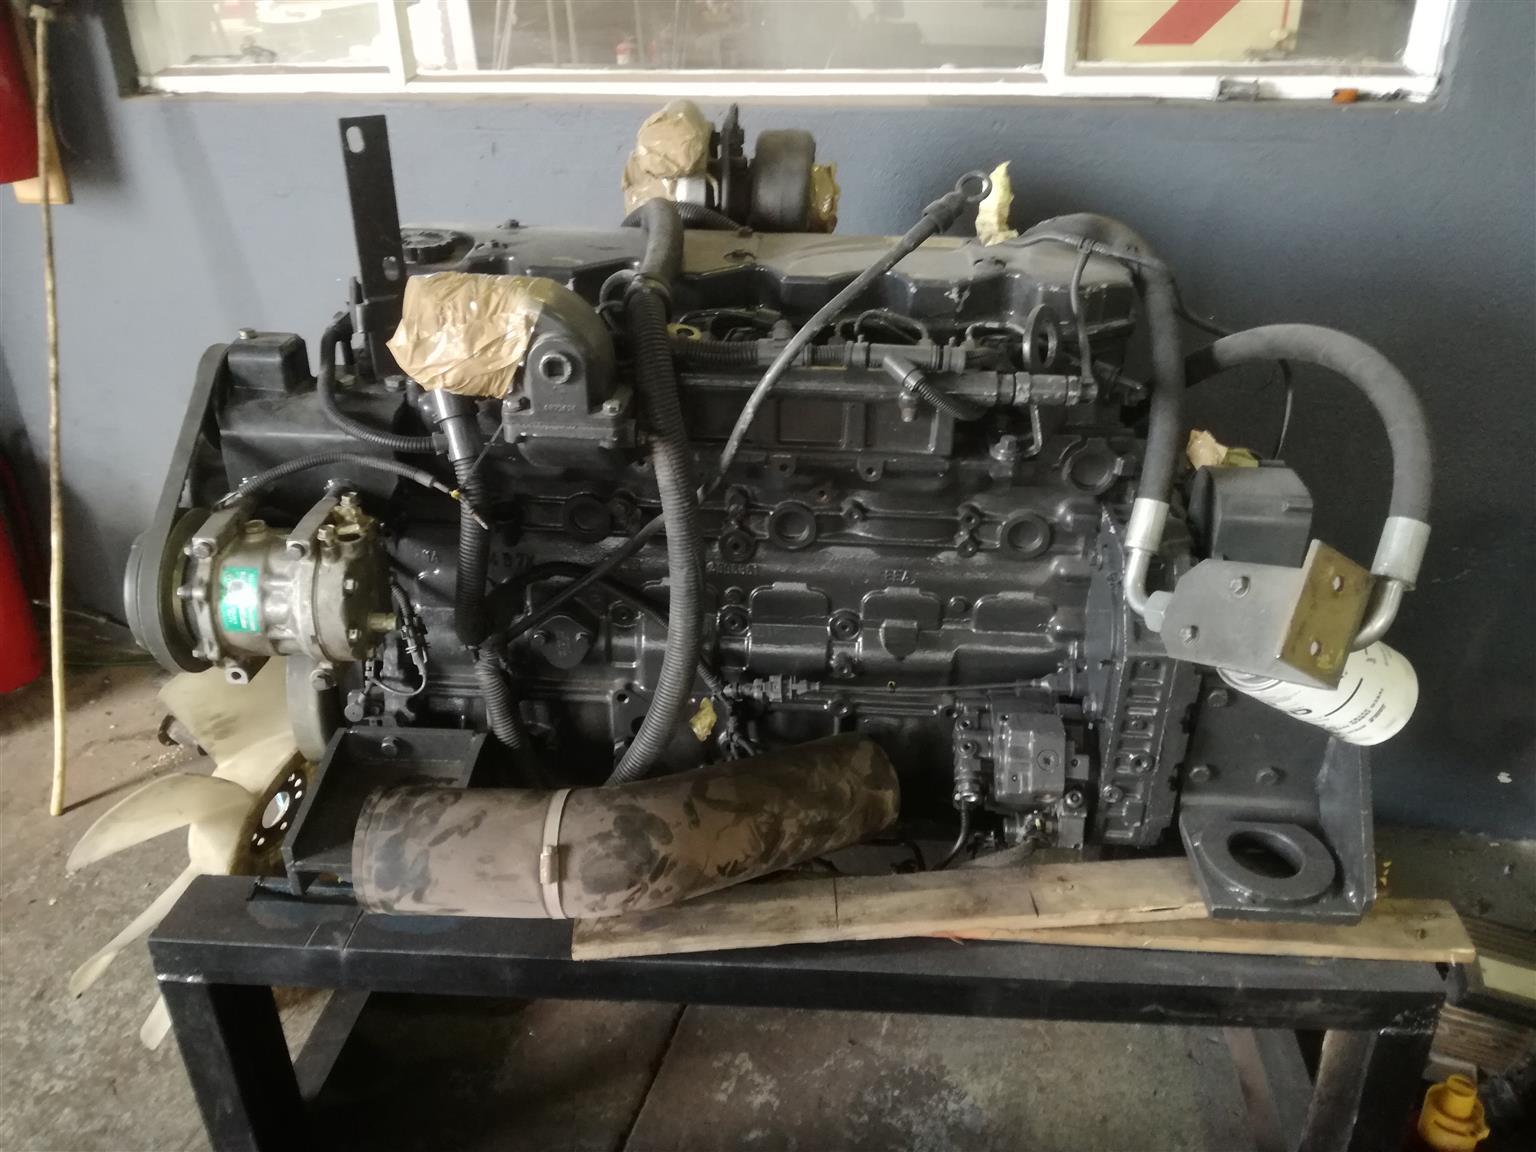 667TA/EEC New Holland/Case/Kobelco CNH U K Engine FOR SALE